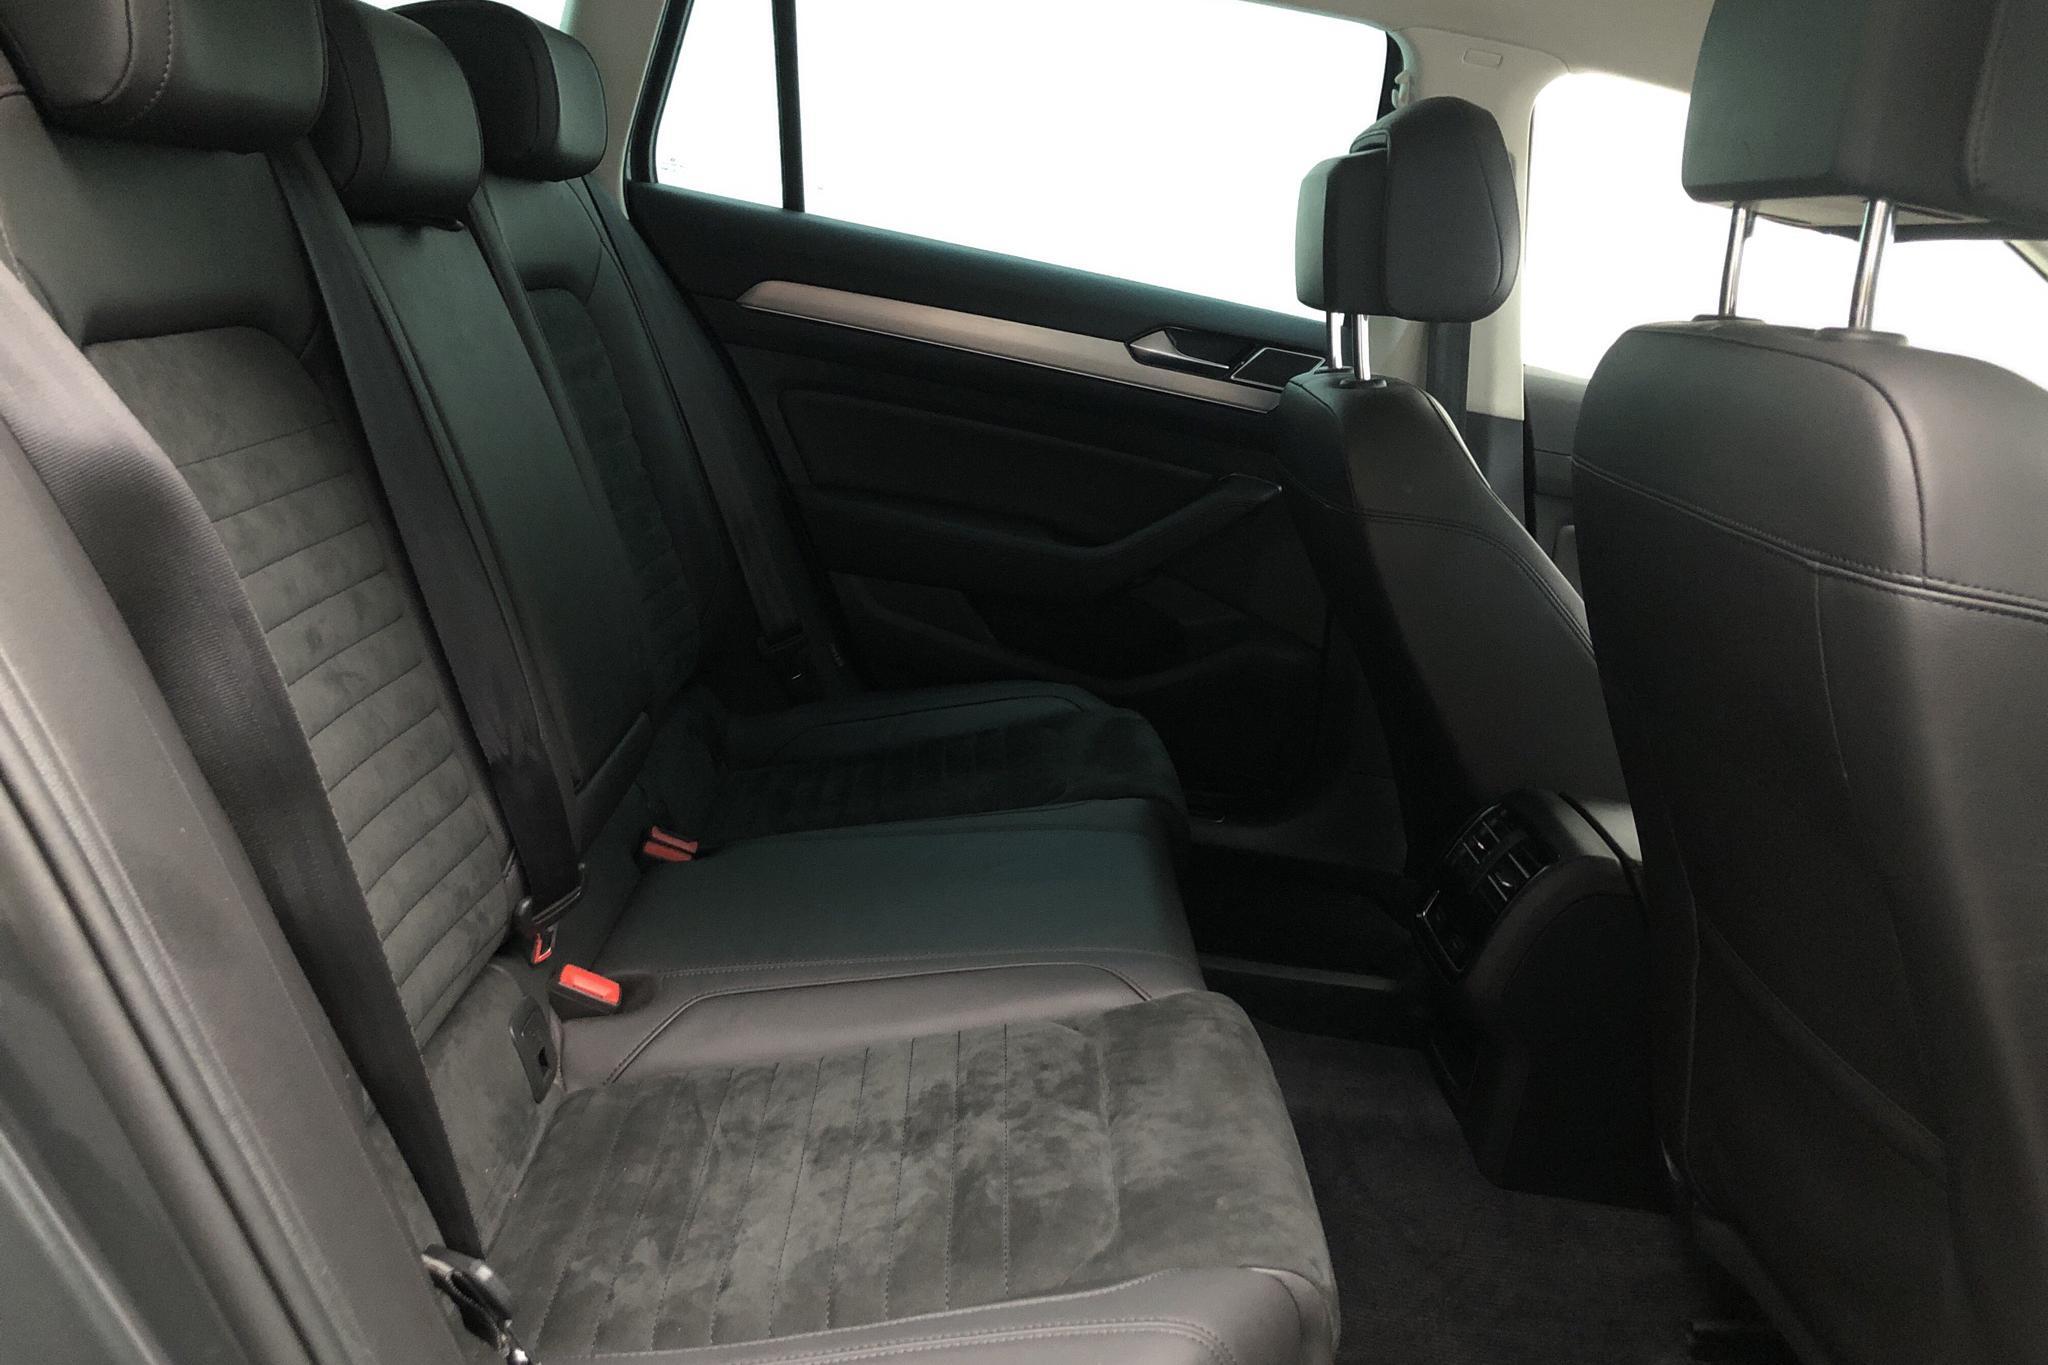 VW Passat 2.0 TDI Sportscombi 4MOTION (190hk) - 11 346 mil - Automat - Dark Grey - 2016